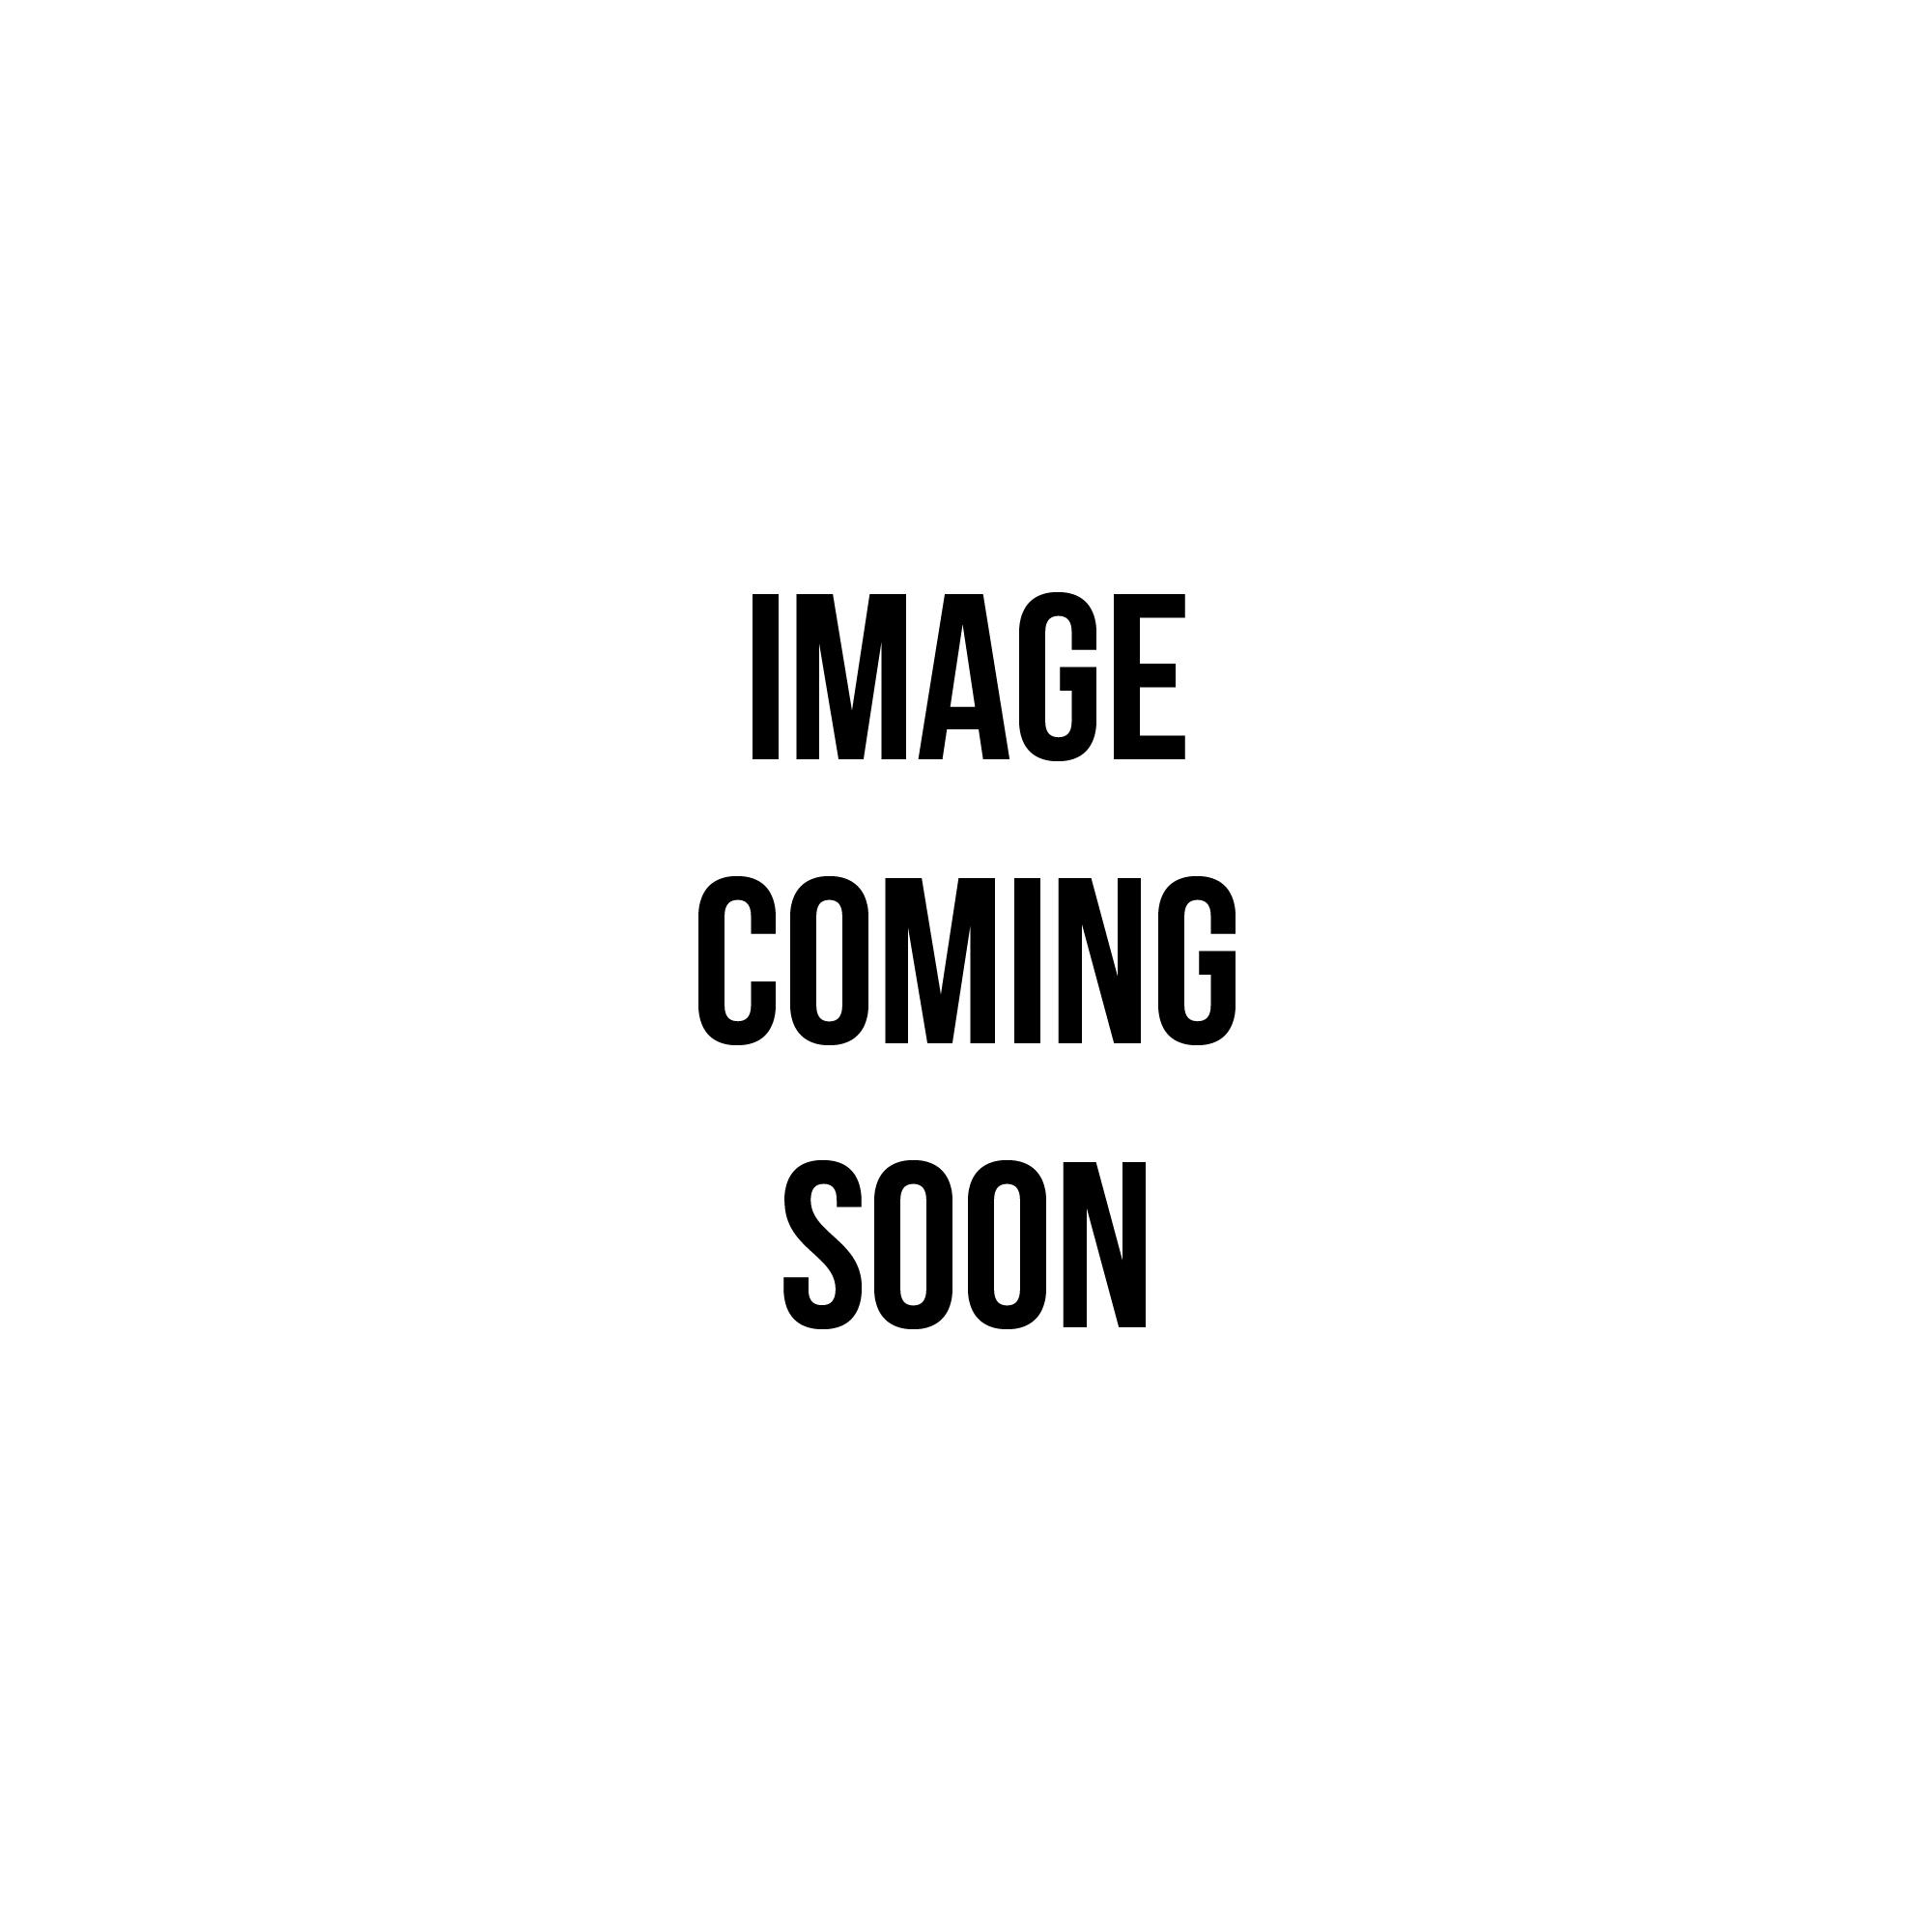 Nike Air Huarache Femmes En Noir Et Blanc Chaussures De Tennis